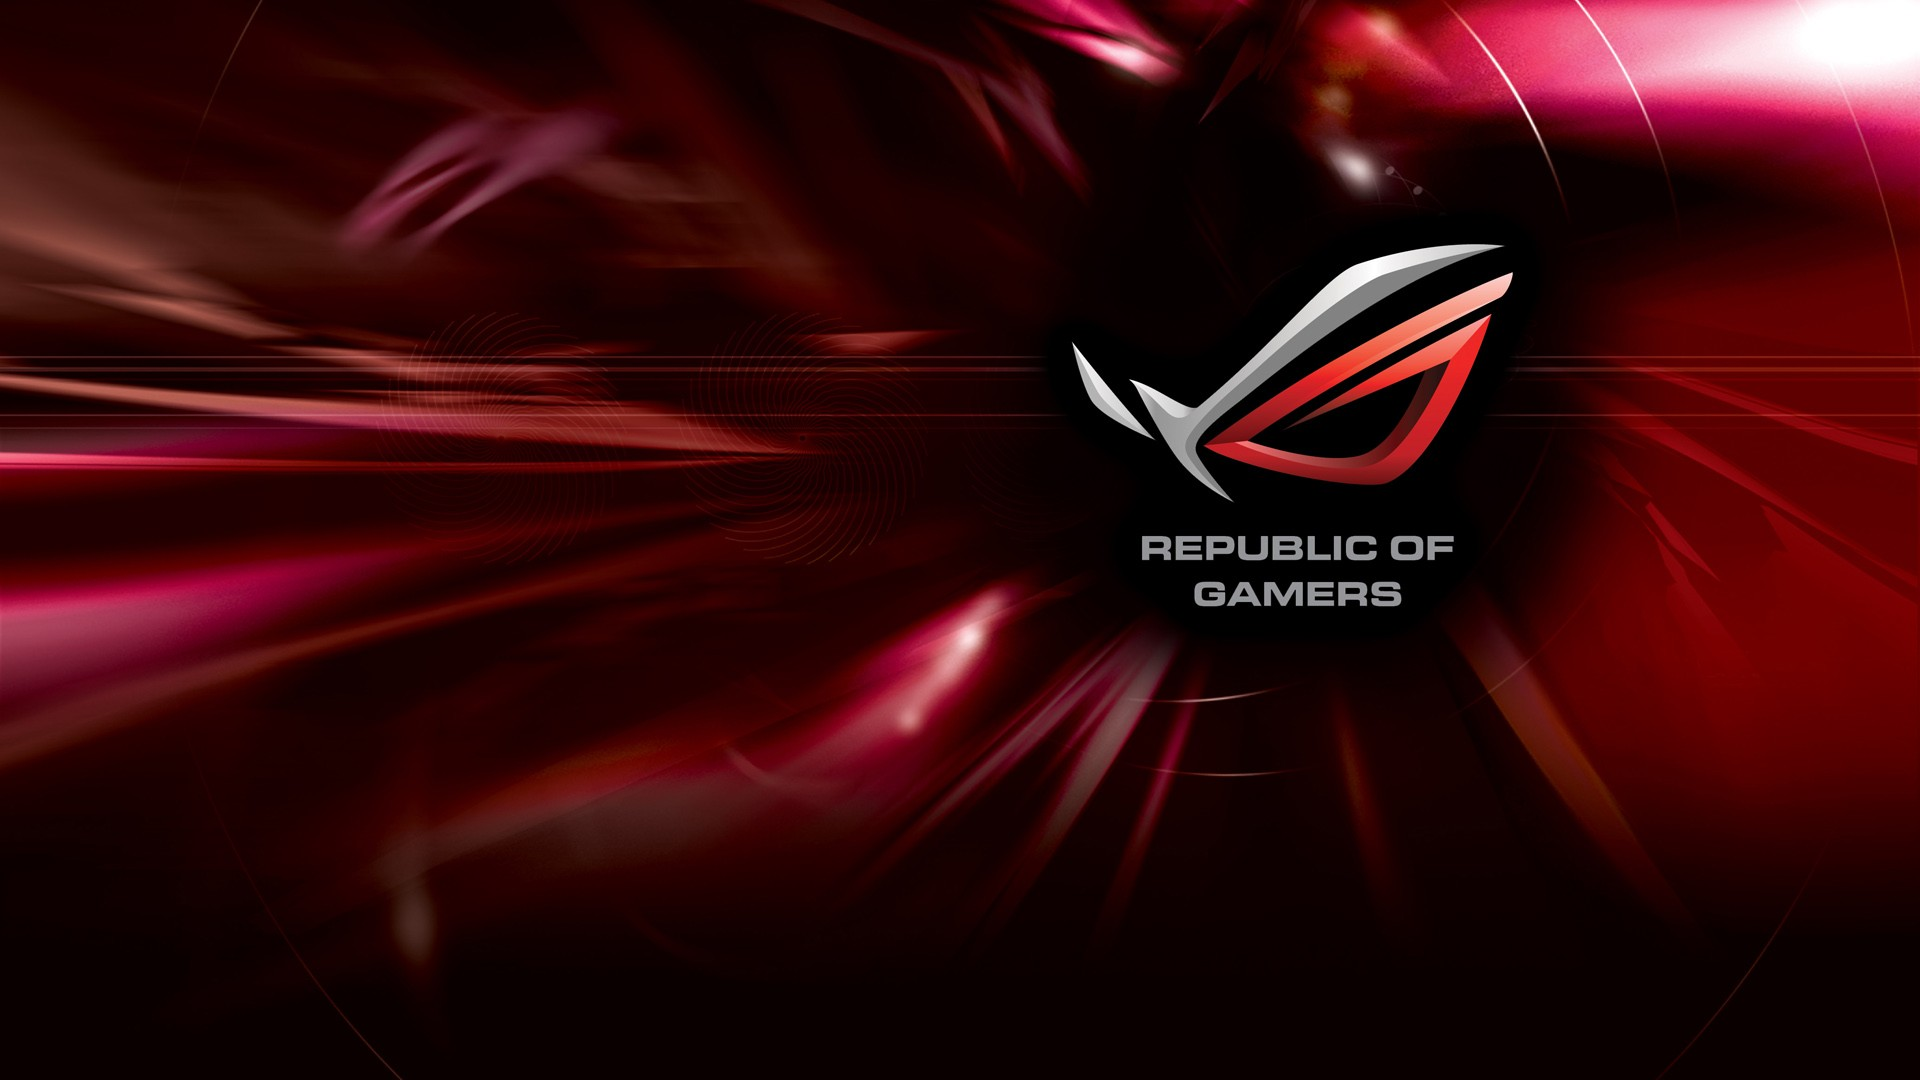 Republic of Gamers wallpaper   715802 1920x1080